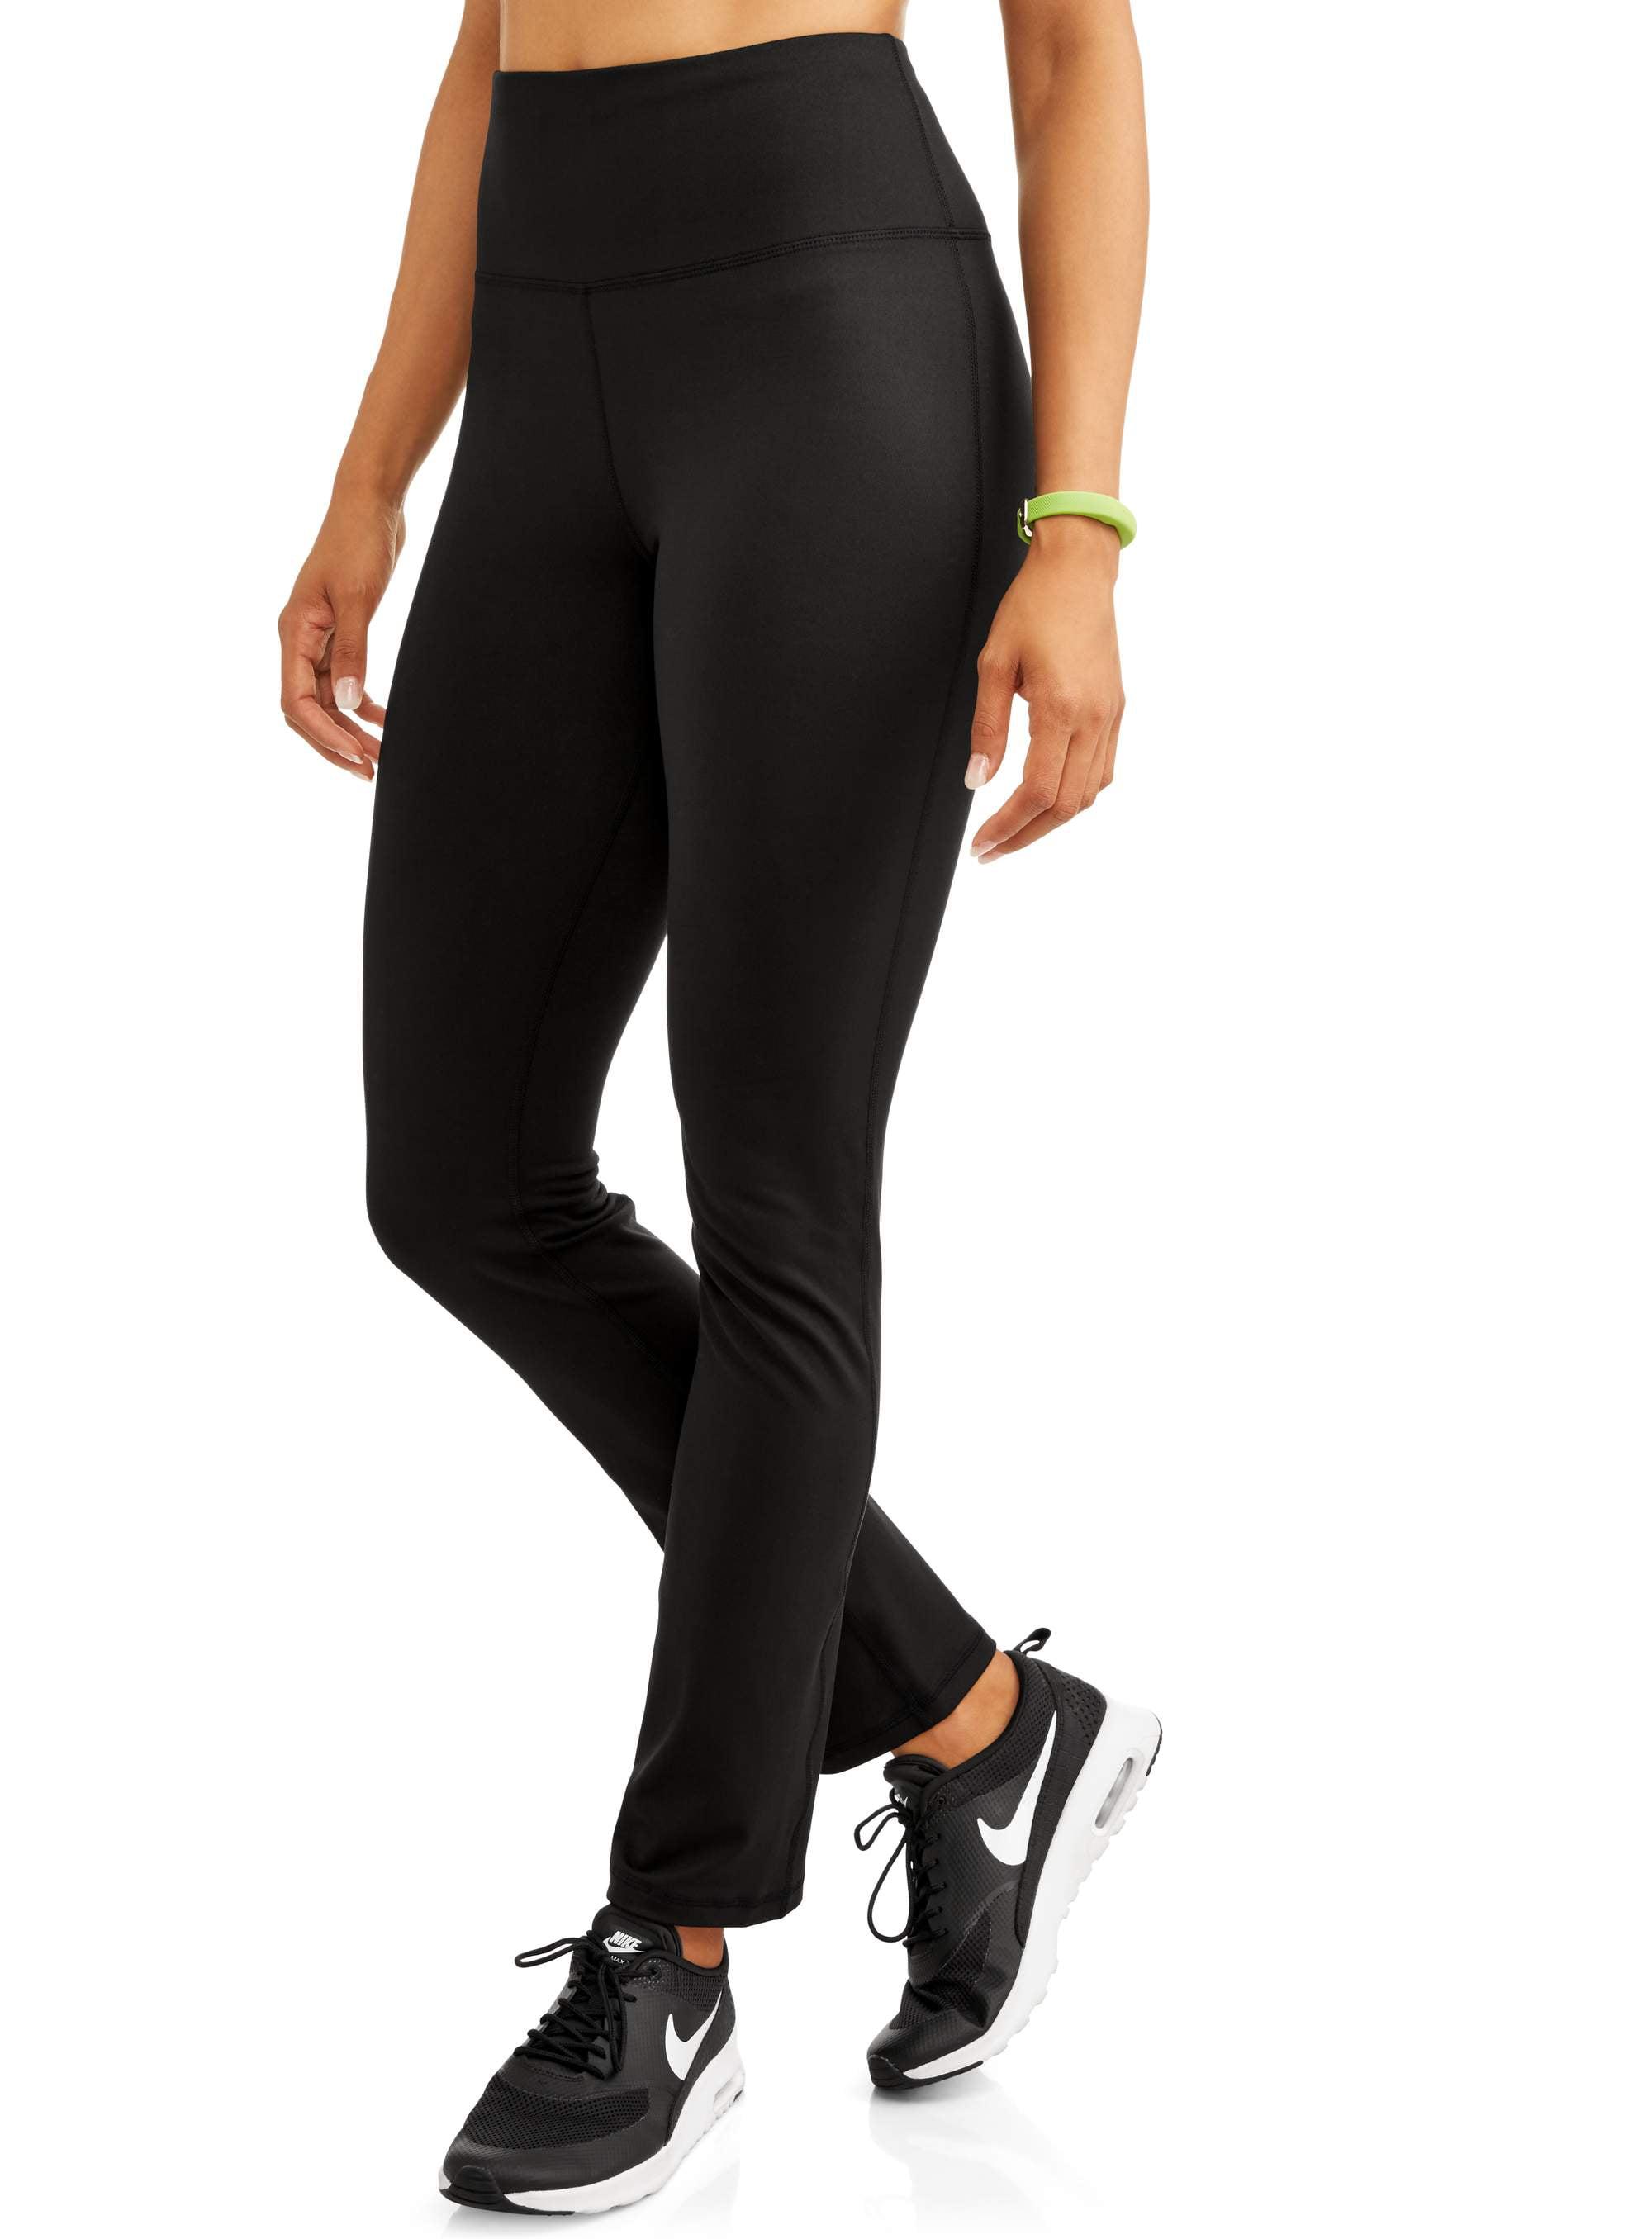 fef9c97b Women's Active High Rise Performance Skinny Pant